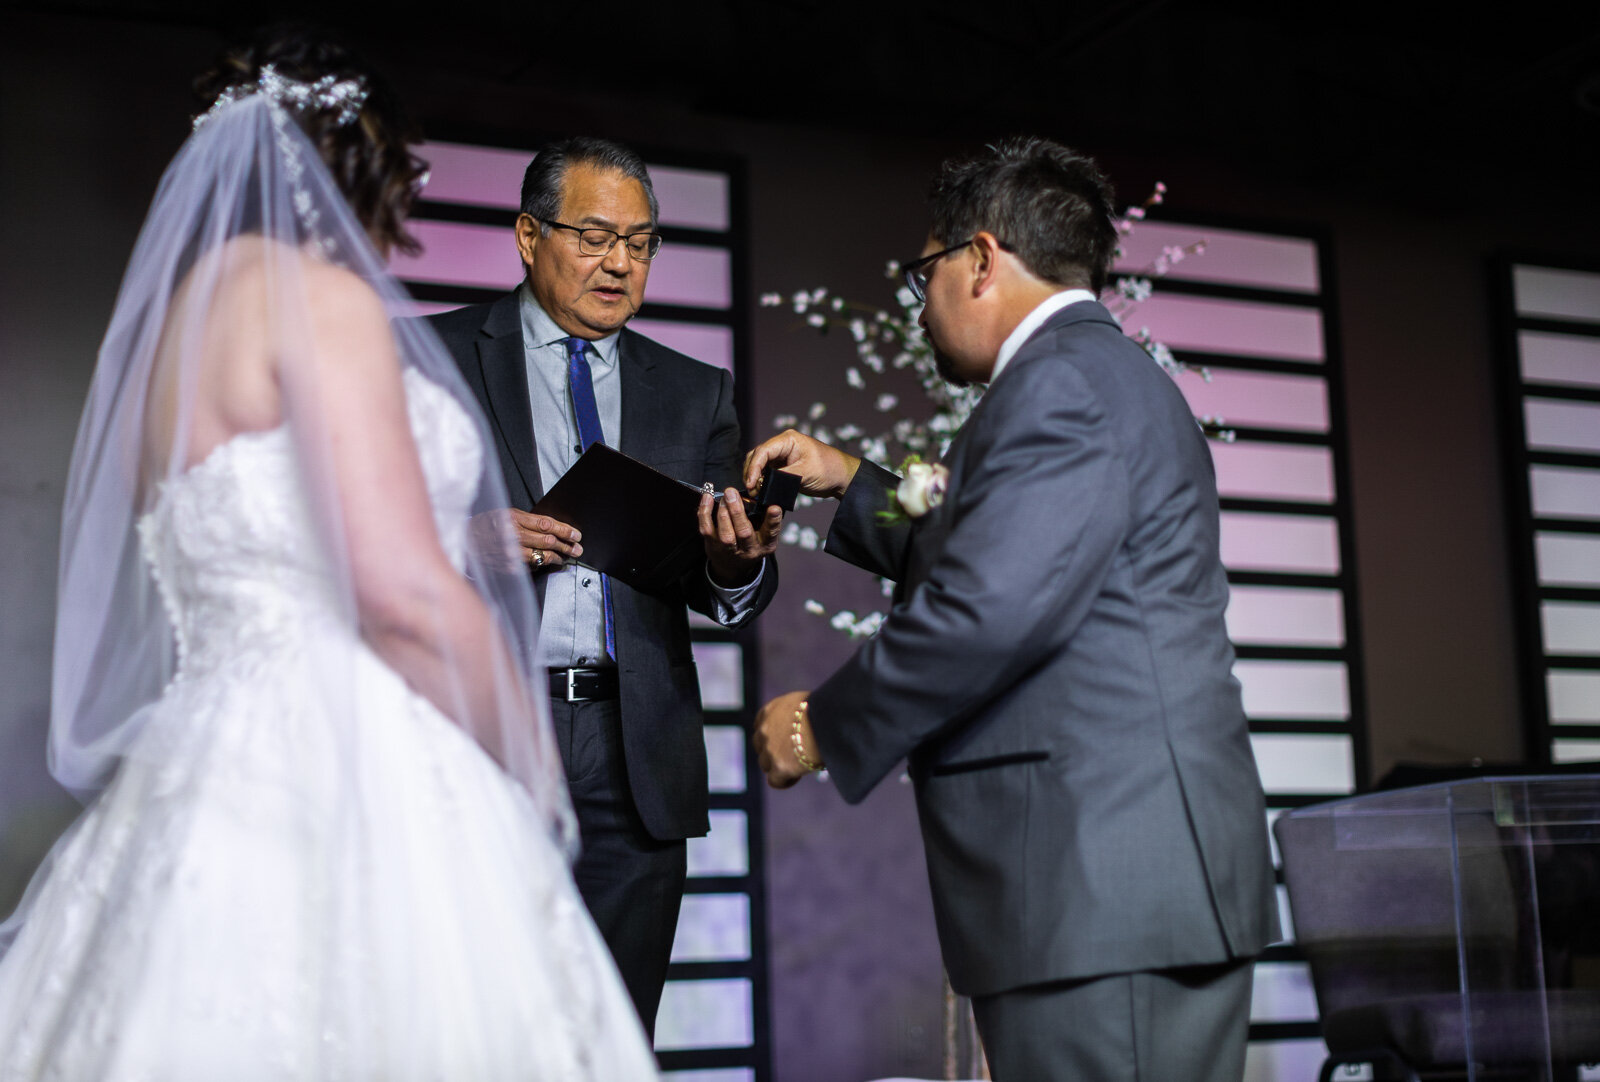 melissa-ryan-wedding-blog-39.jpg